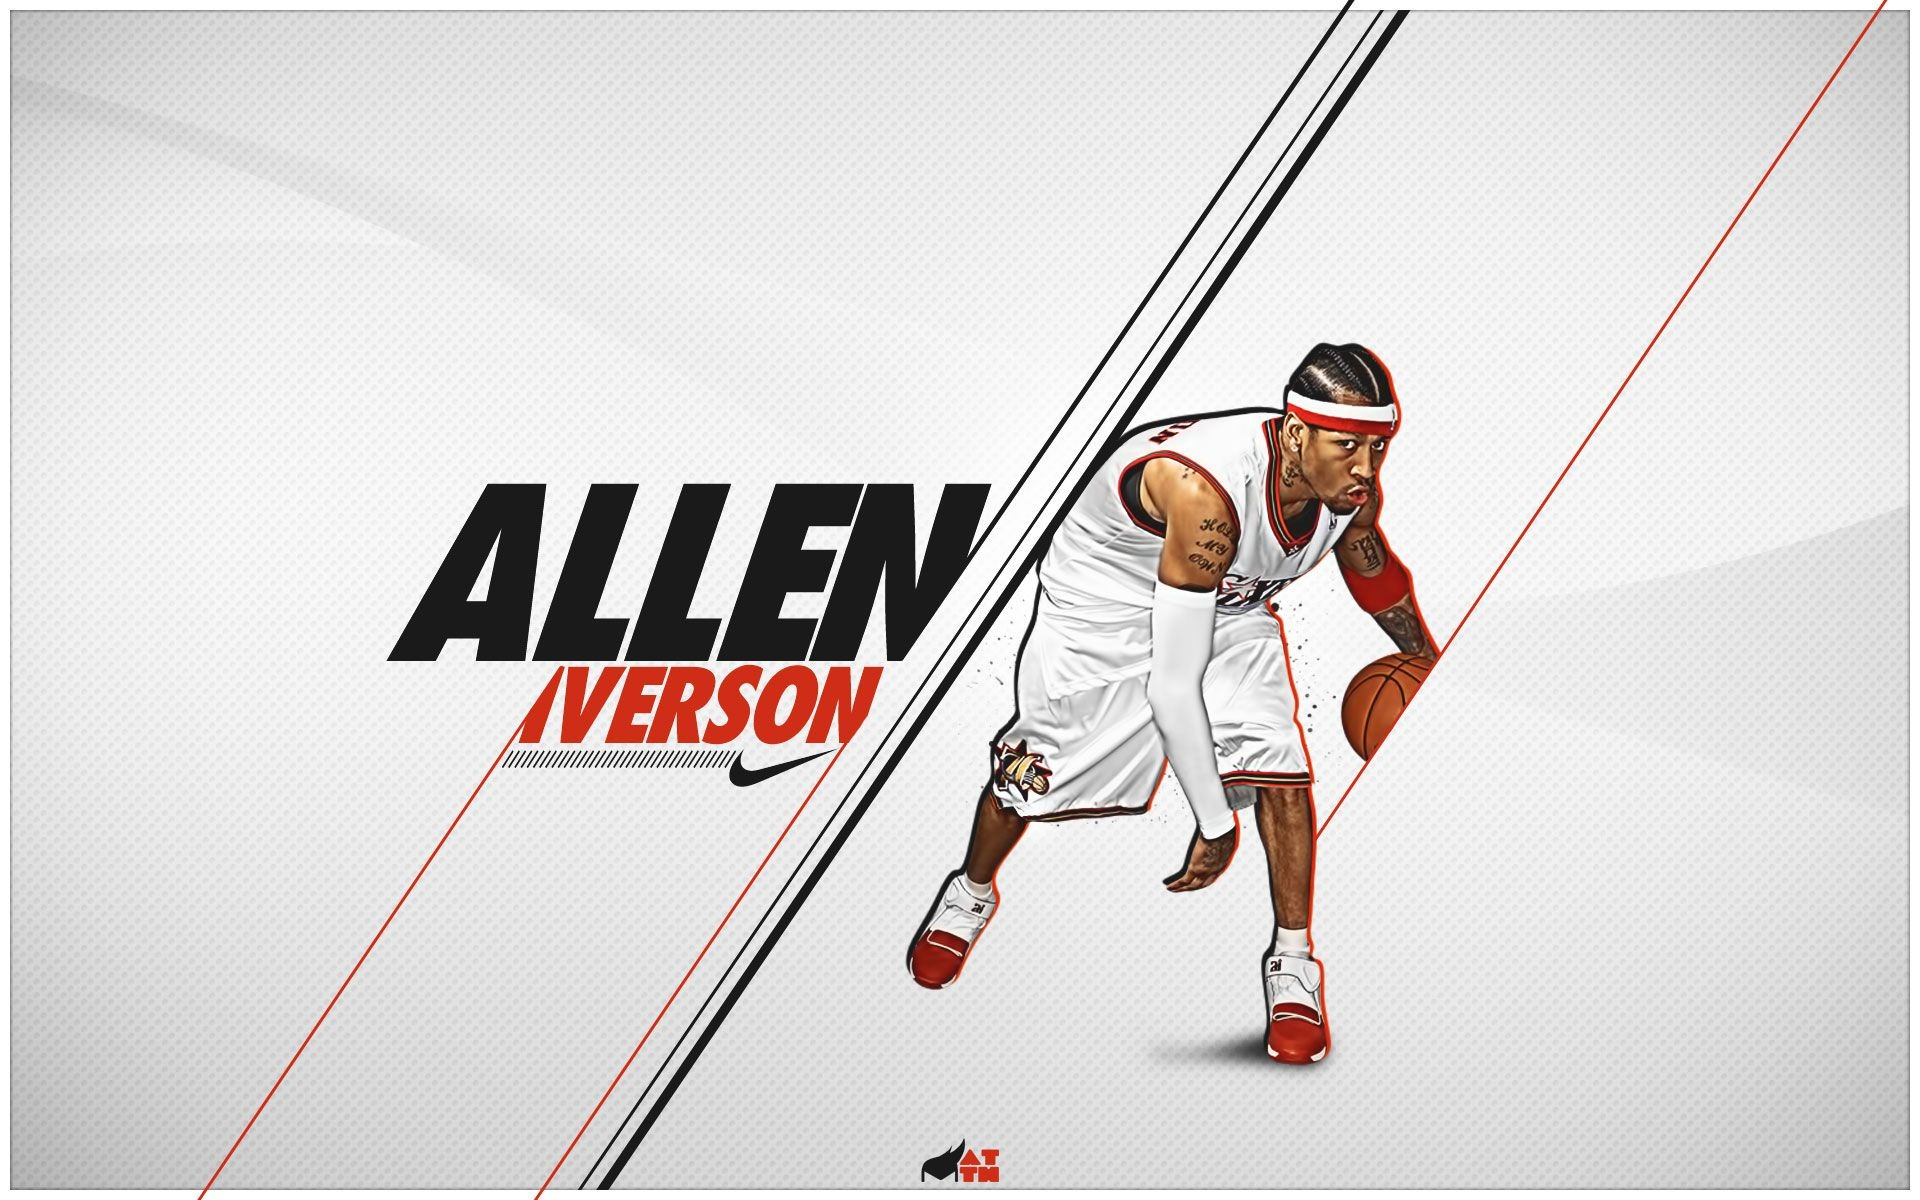 3072x2021 Allen Iverson Wallpaper High Definition Backgrounds